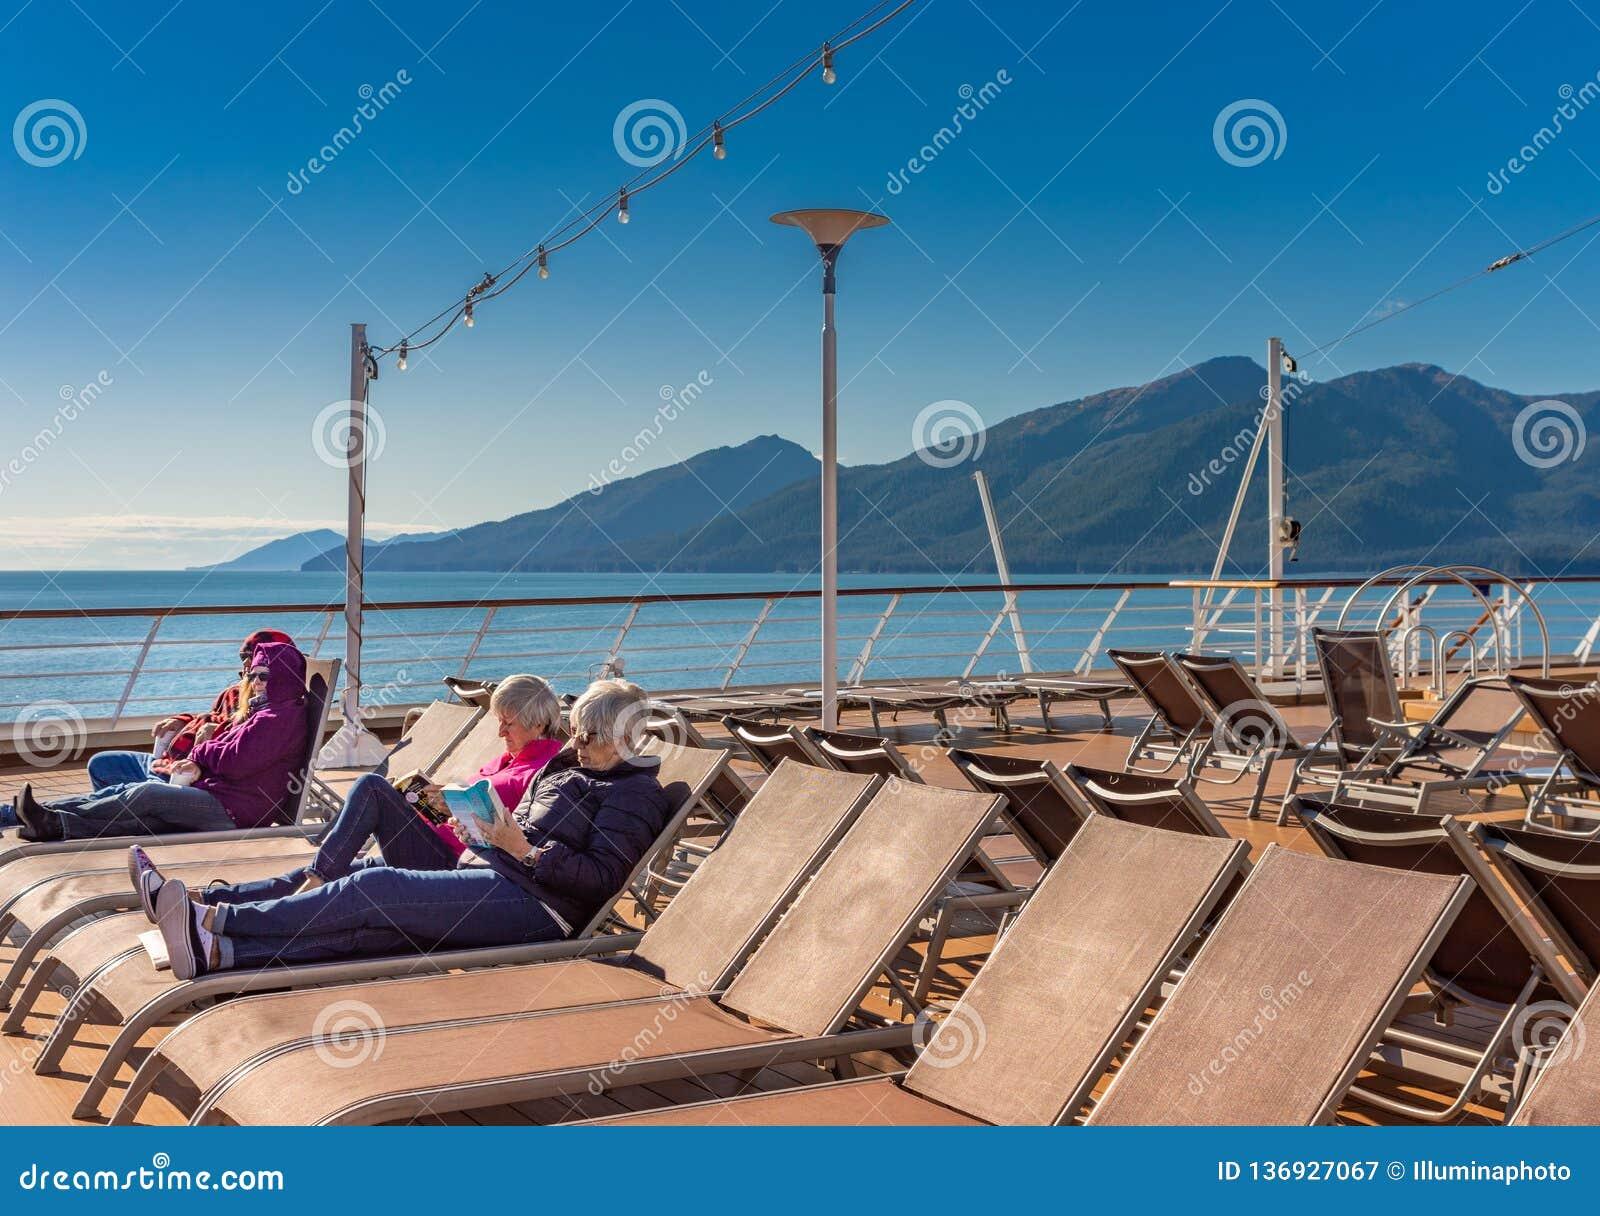 September 14, 2018 - Inside Passage, Alaska: Cruise passengers reading outdoors.